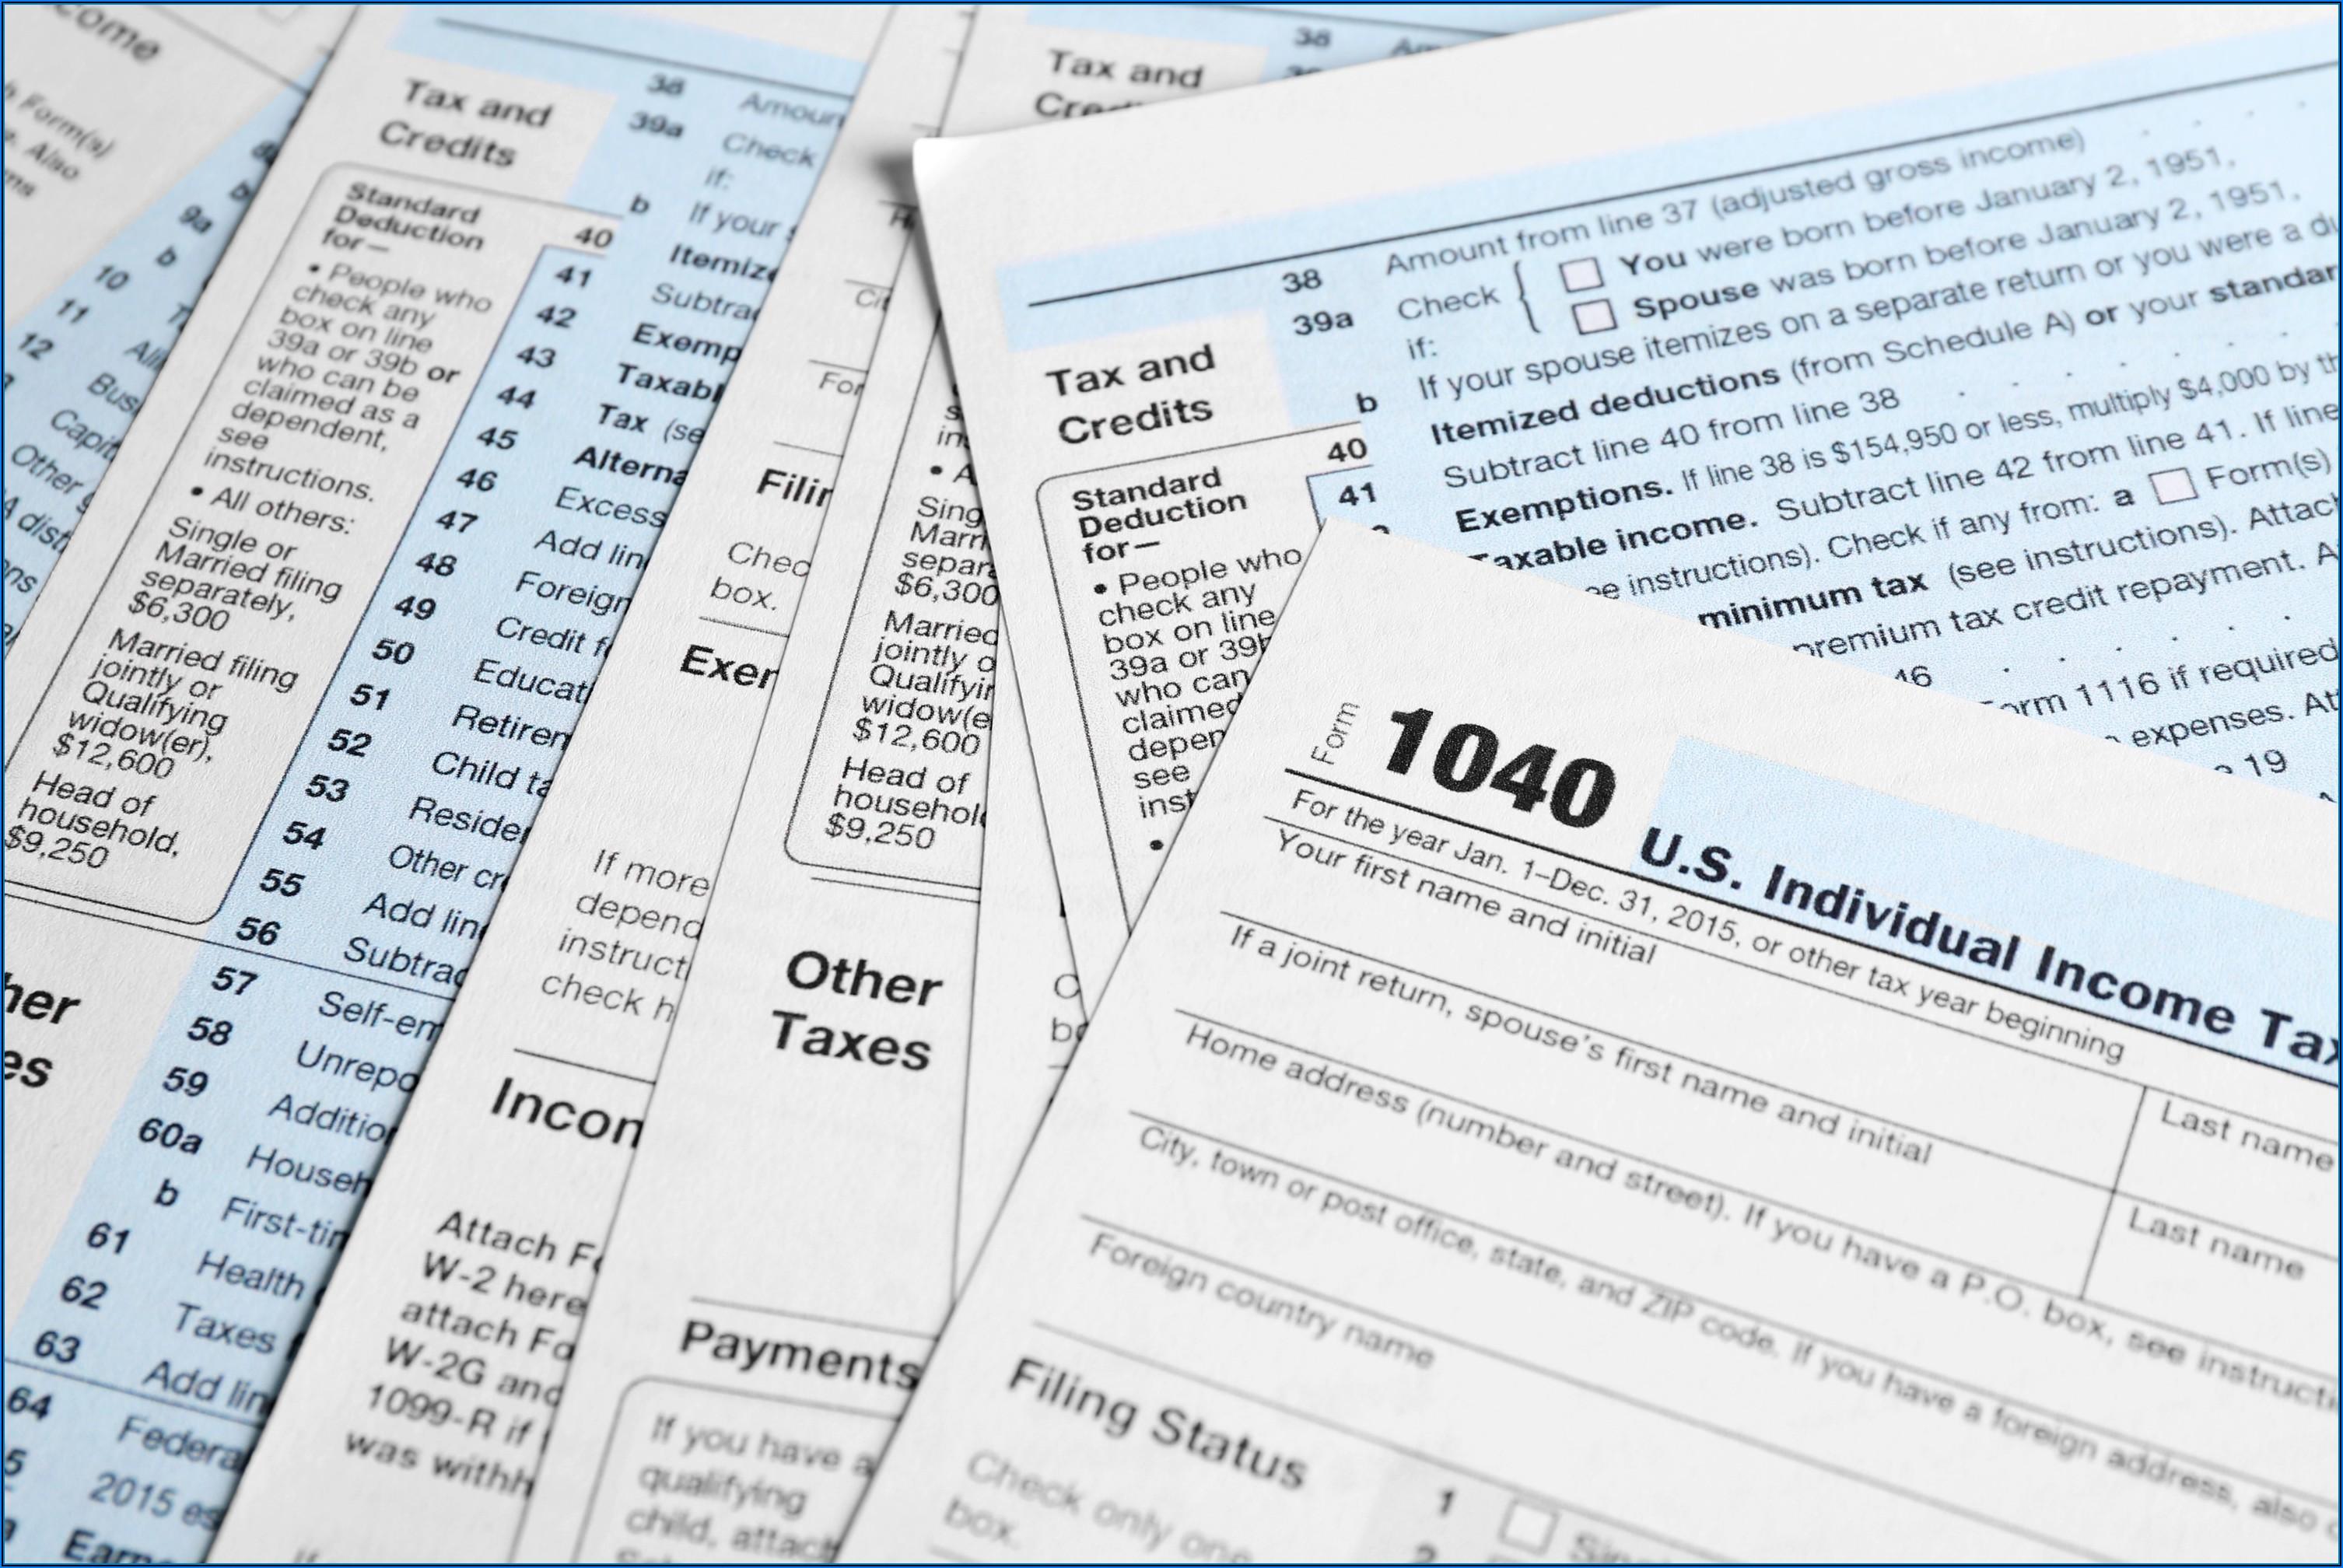 Irs Tax Forms 1040ez Free